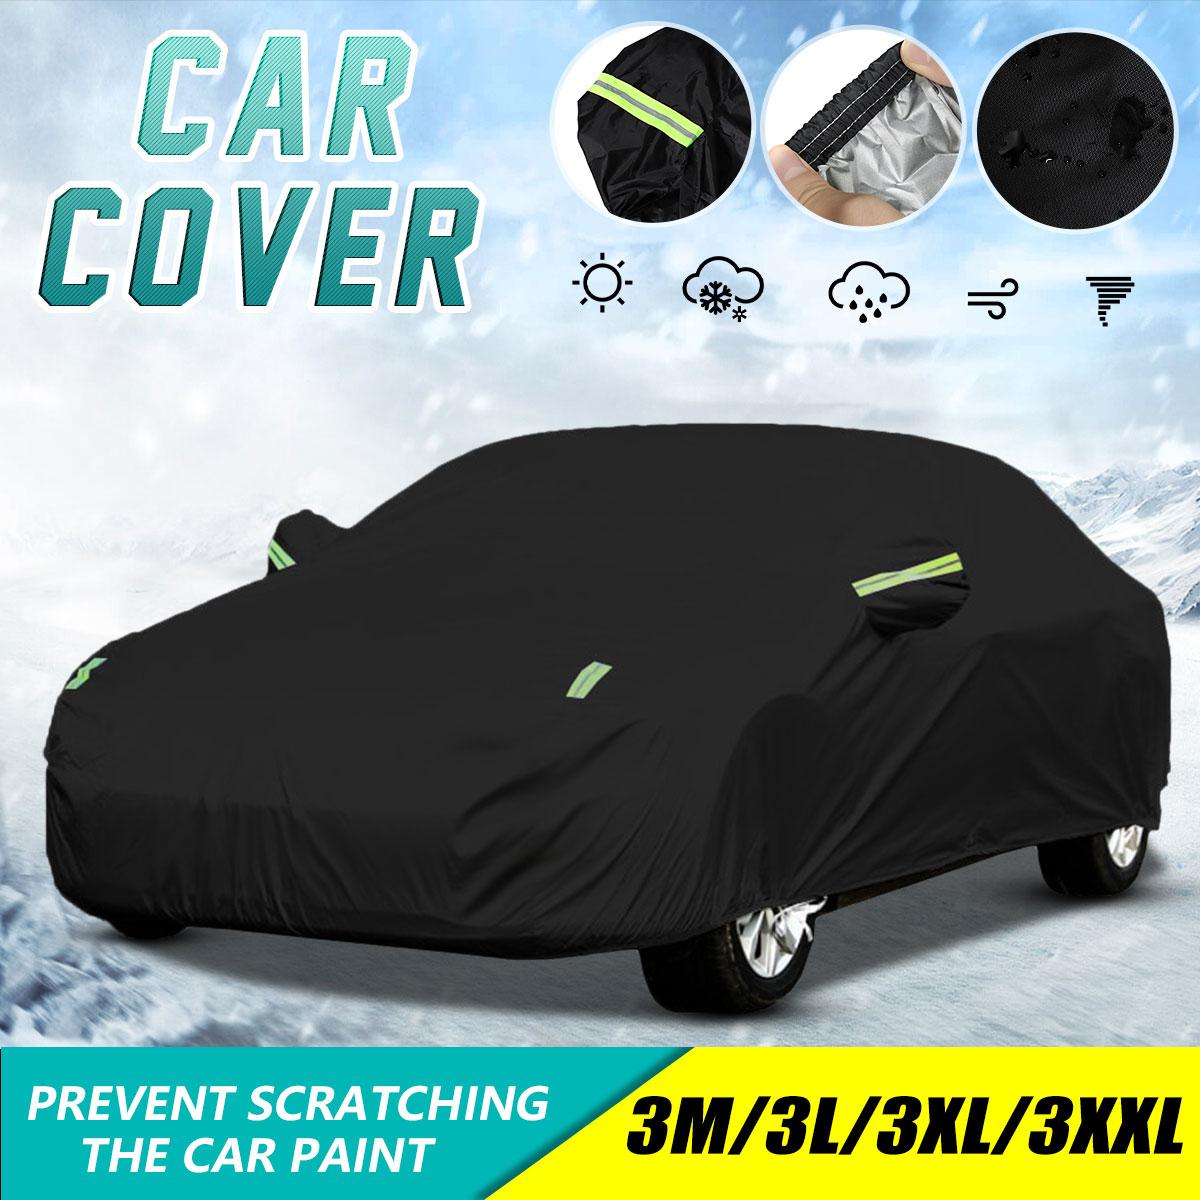 Universal Full Car Cover Black Outdoor Waterproof Snow Protect 190T Cover Anti UV Sun Shade Dustproo